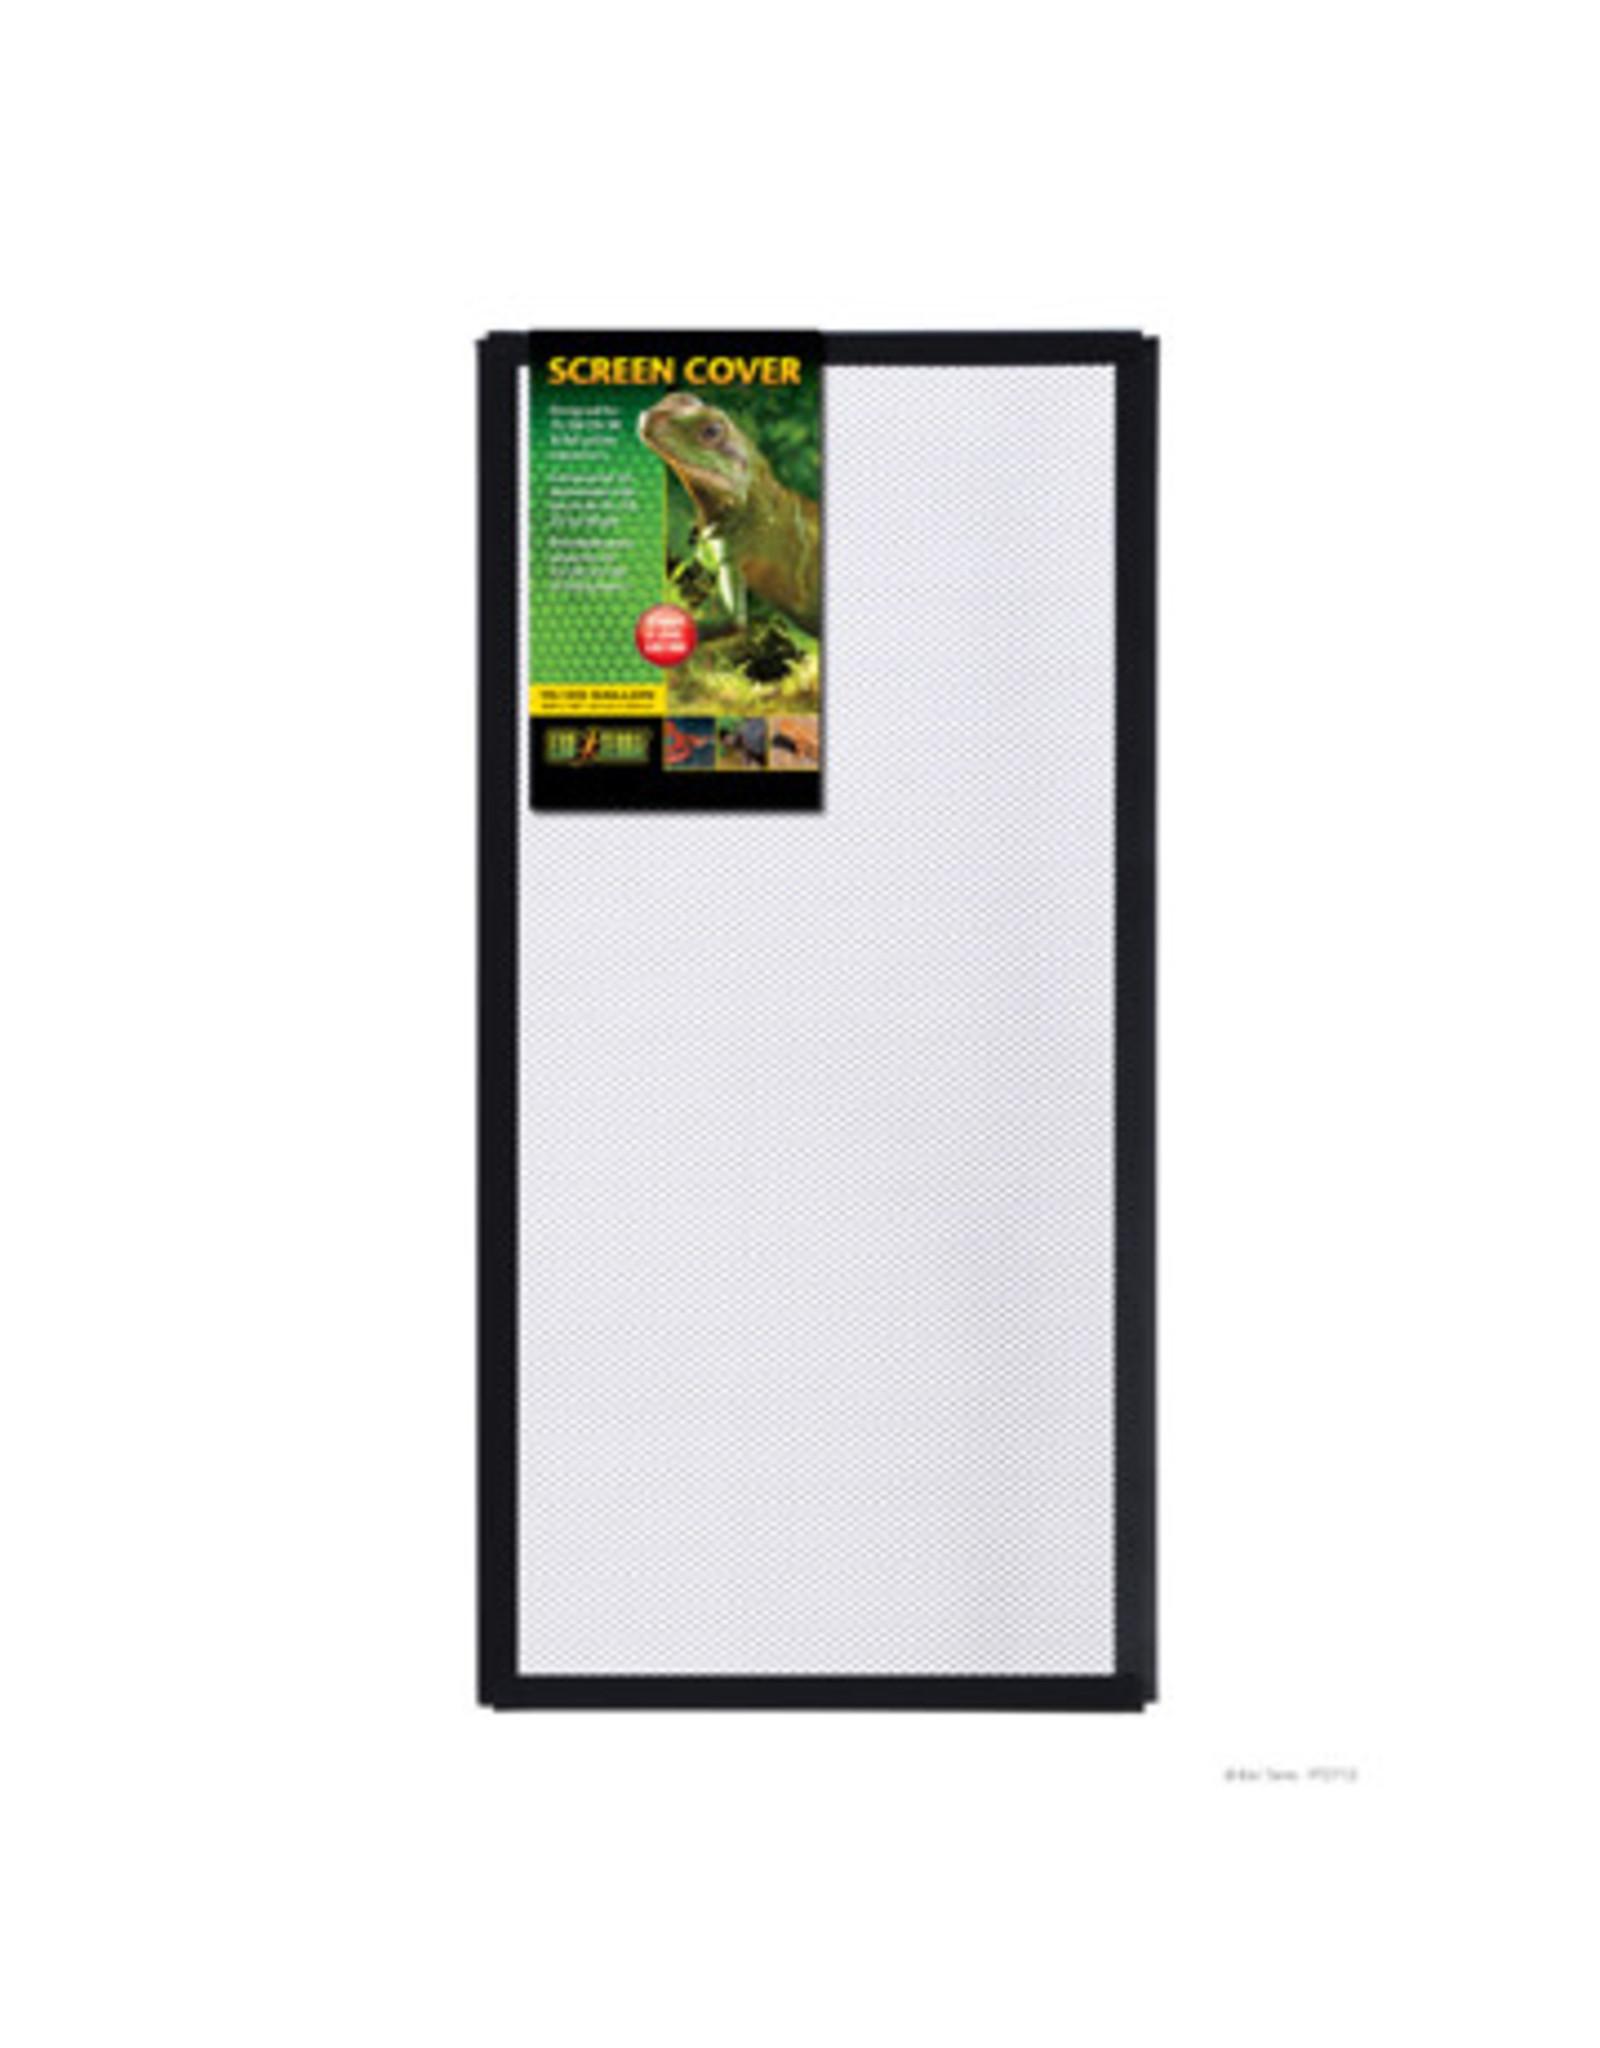 Exo Terra Terrarium Screen Cover - 61 x 30 cm(24 x 12 in)